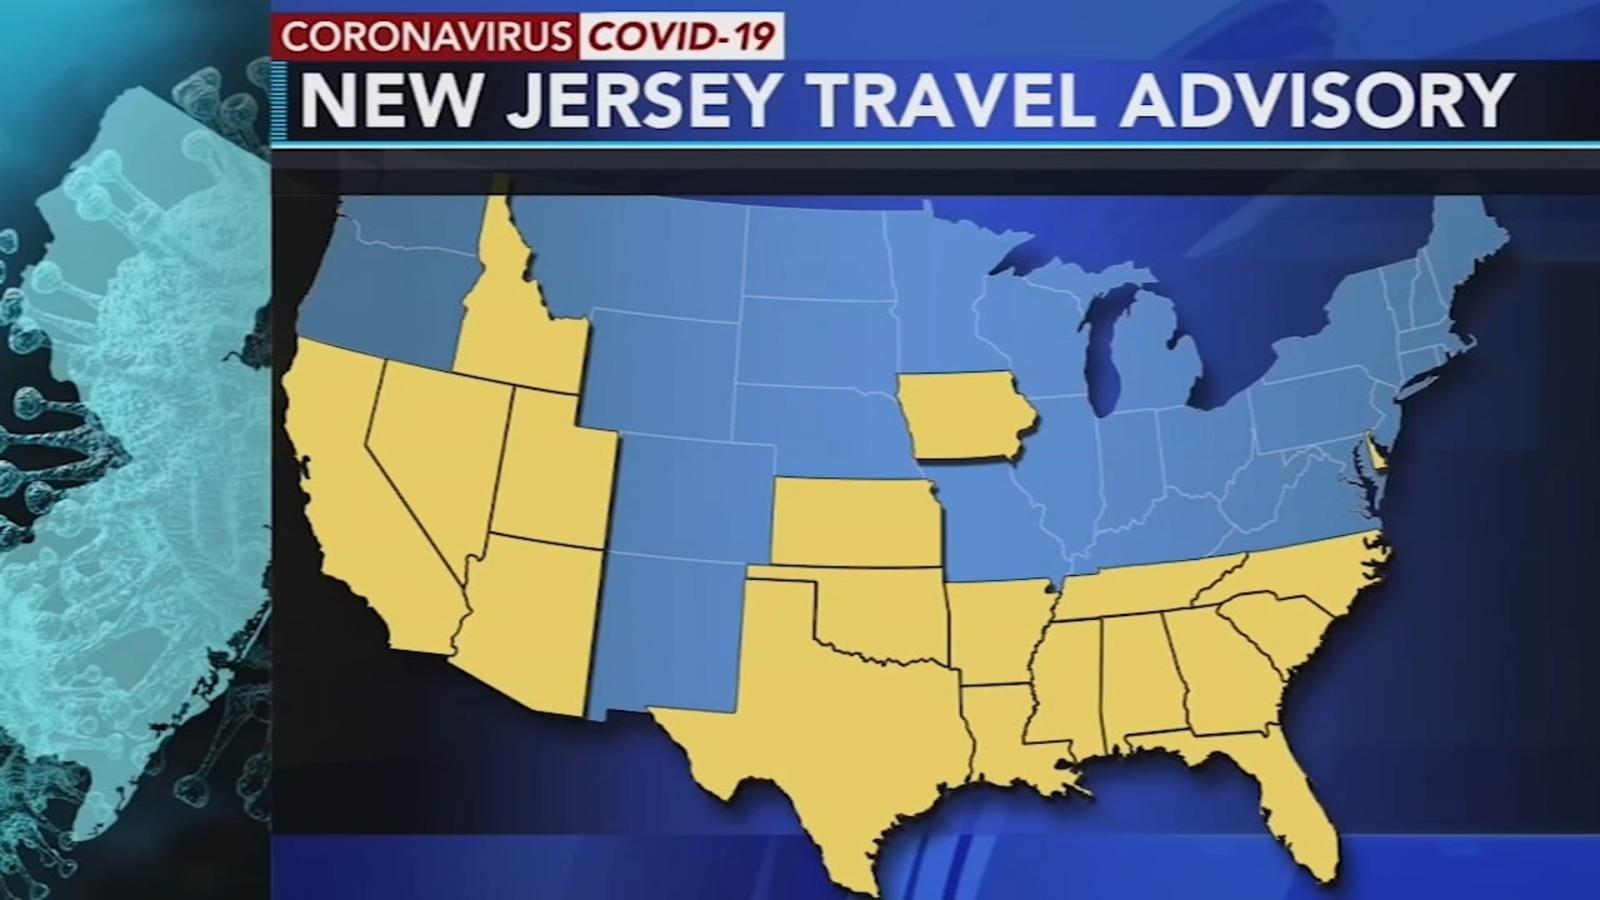 6305344 070720 wpvi del travel advisory 5pm CC vid jpg?w=1600.'